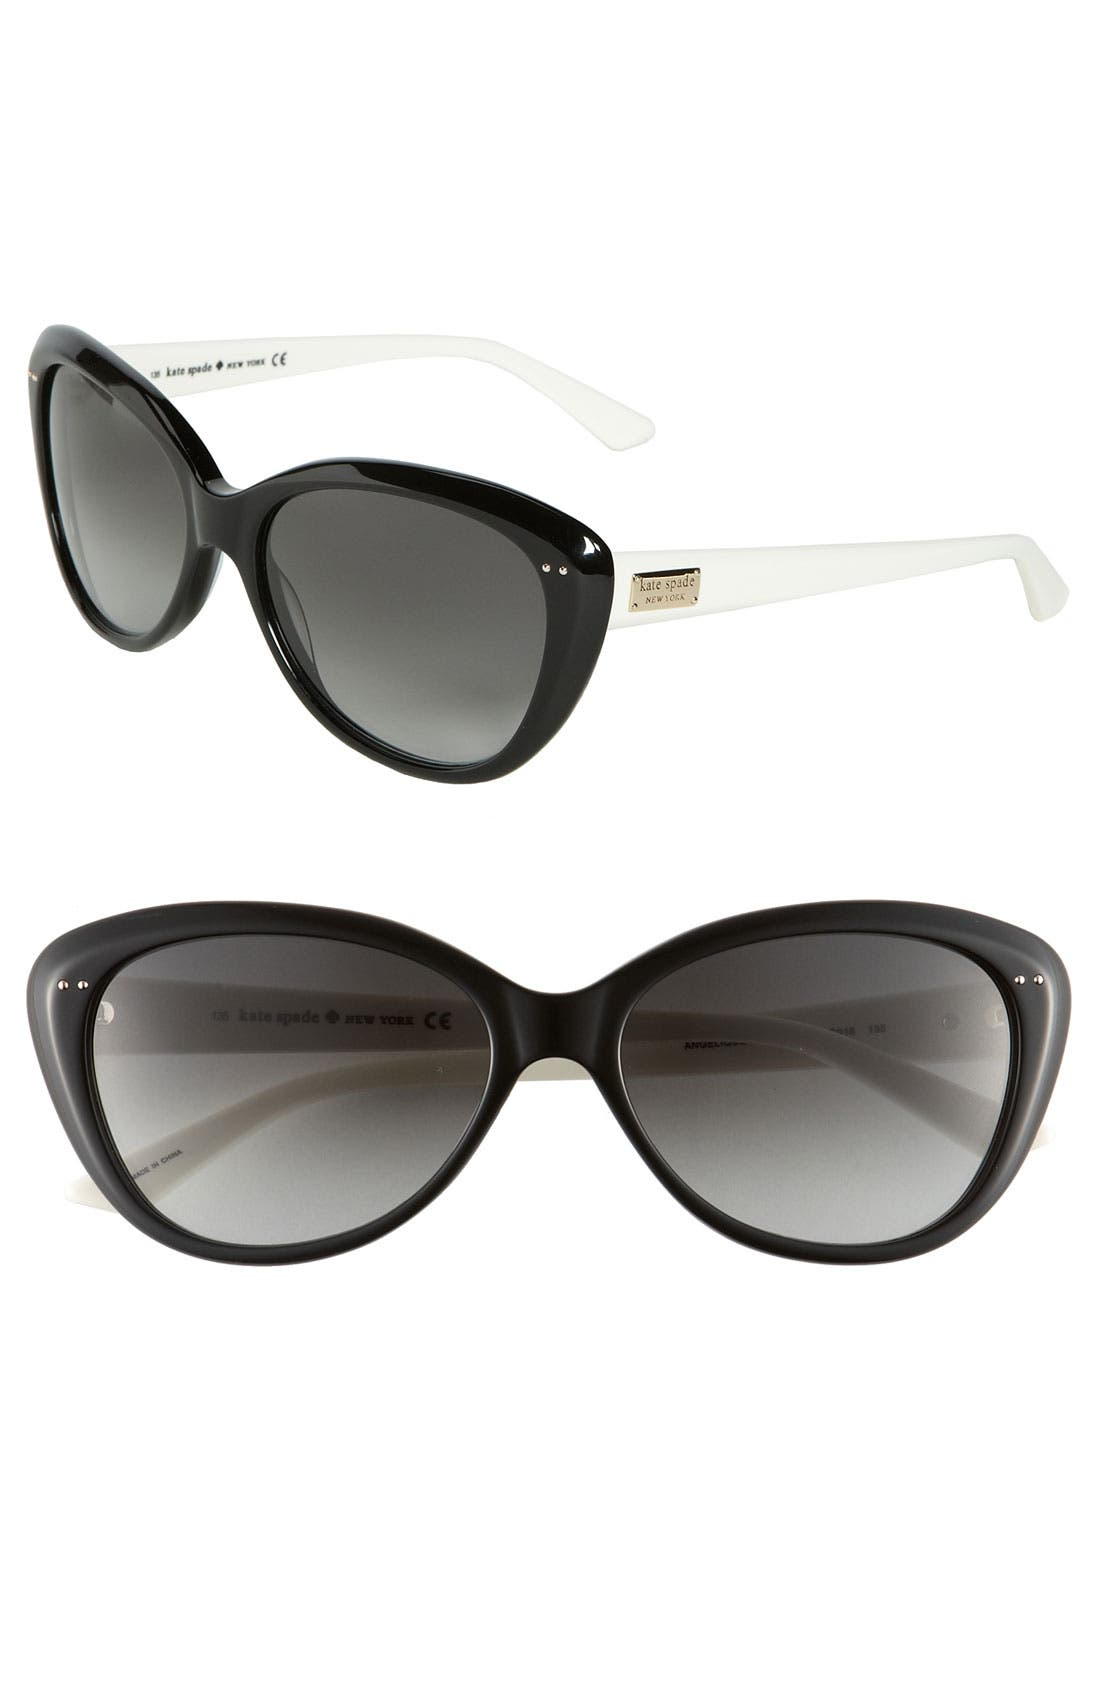 KATE SPADE NEW YORK,                             'angelique' 55mm retro sunglasses,                             Main thumbnail 1, color,                             001